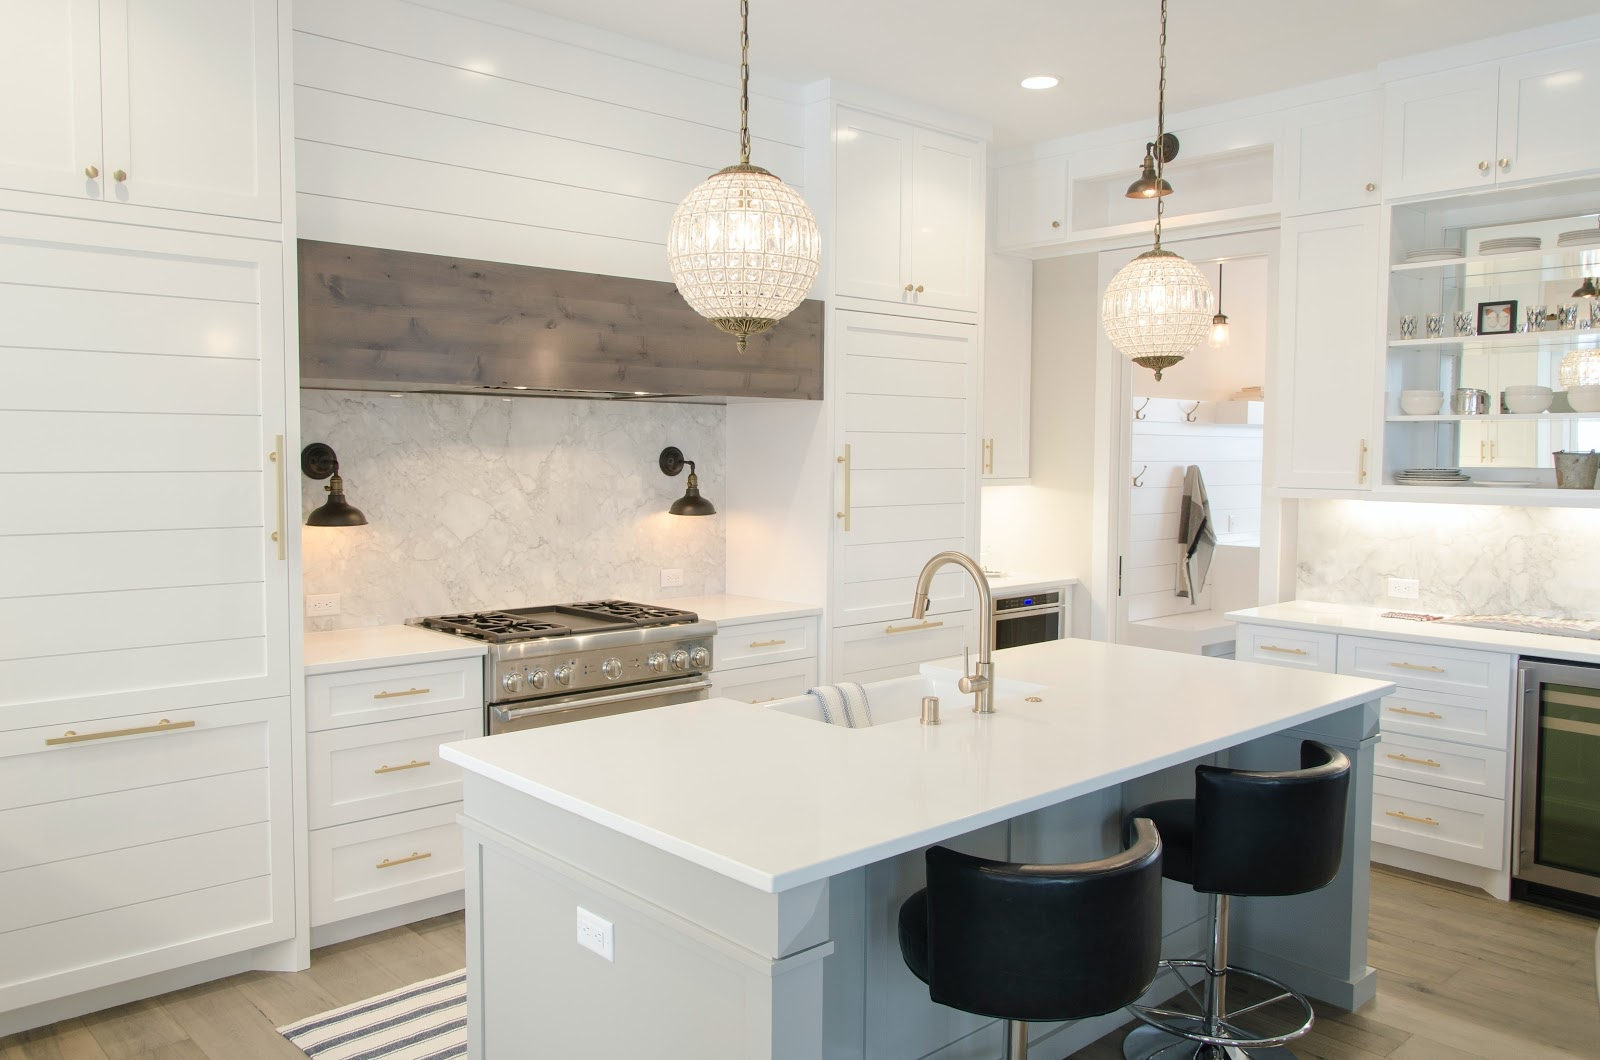 5 Beautiful Kitchen Backsplash Tile Ideas This Lady Blogs